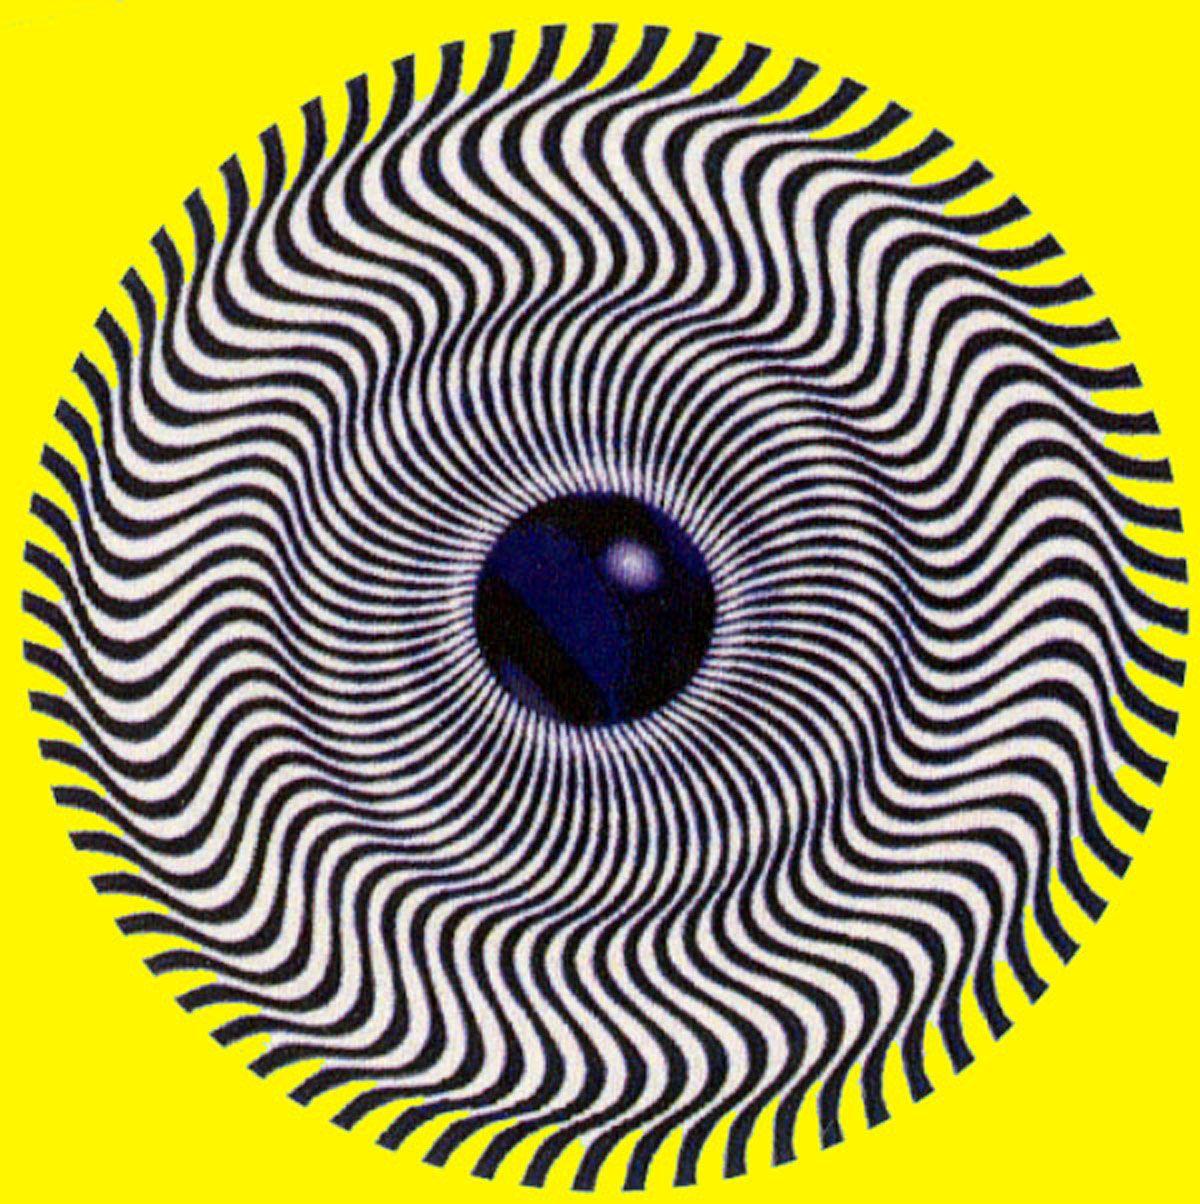 Photos illusion car moving optical illusion spectacular optical - Trippy Moving Illusions Backgrounds Moving Illusions Wallpaper Trippy Pinterest Trippy Illusions And Nike Wallpaper Iphone